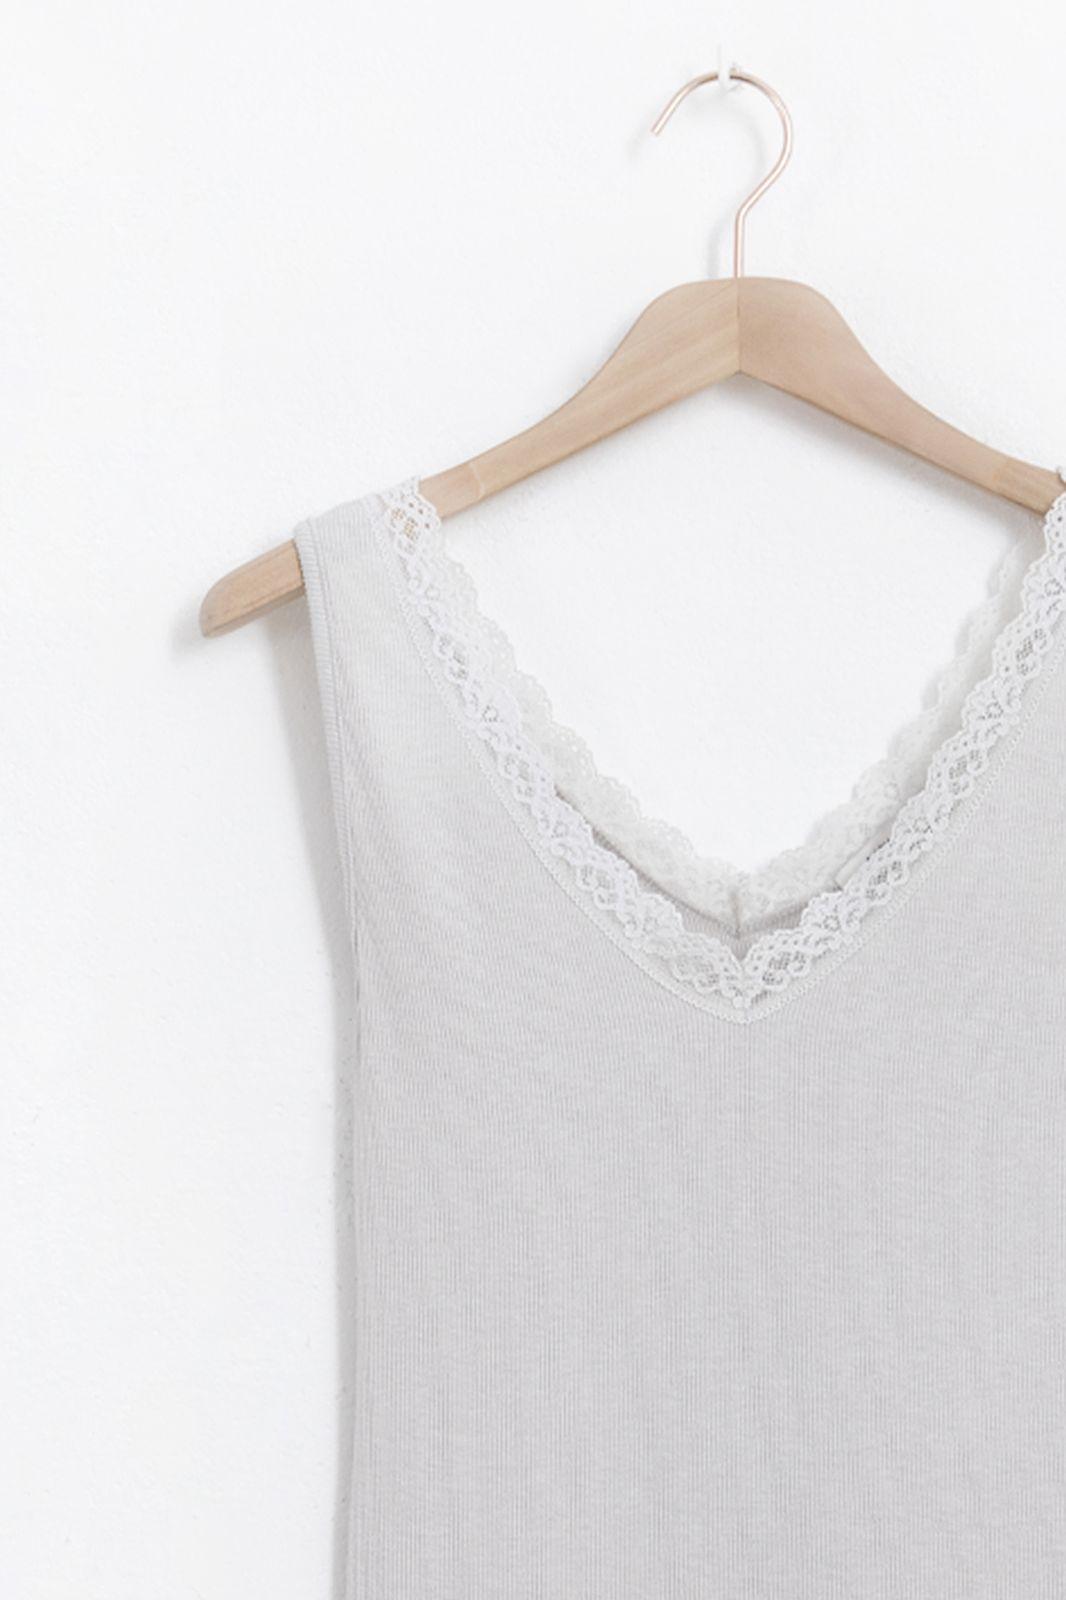 Grijze rib singlet met kanten details - Dames | Sissy-Boy